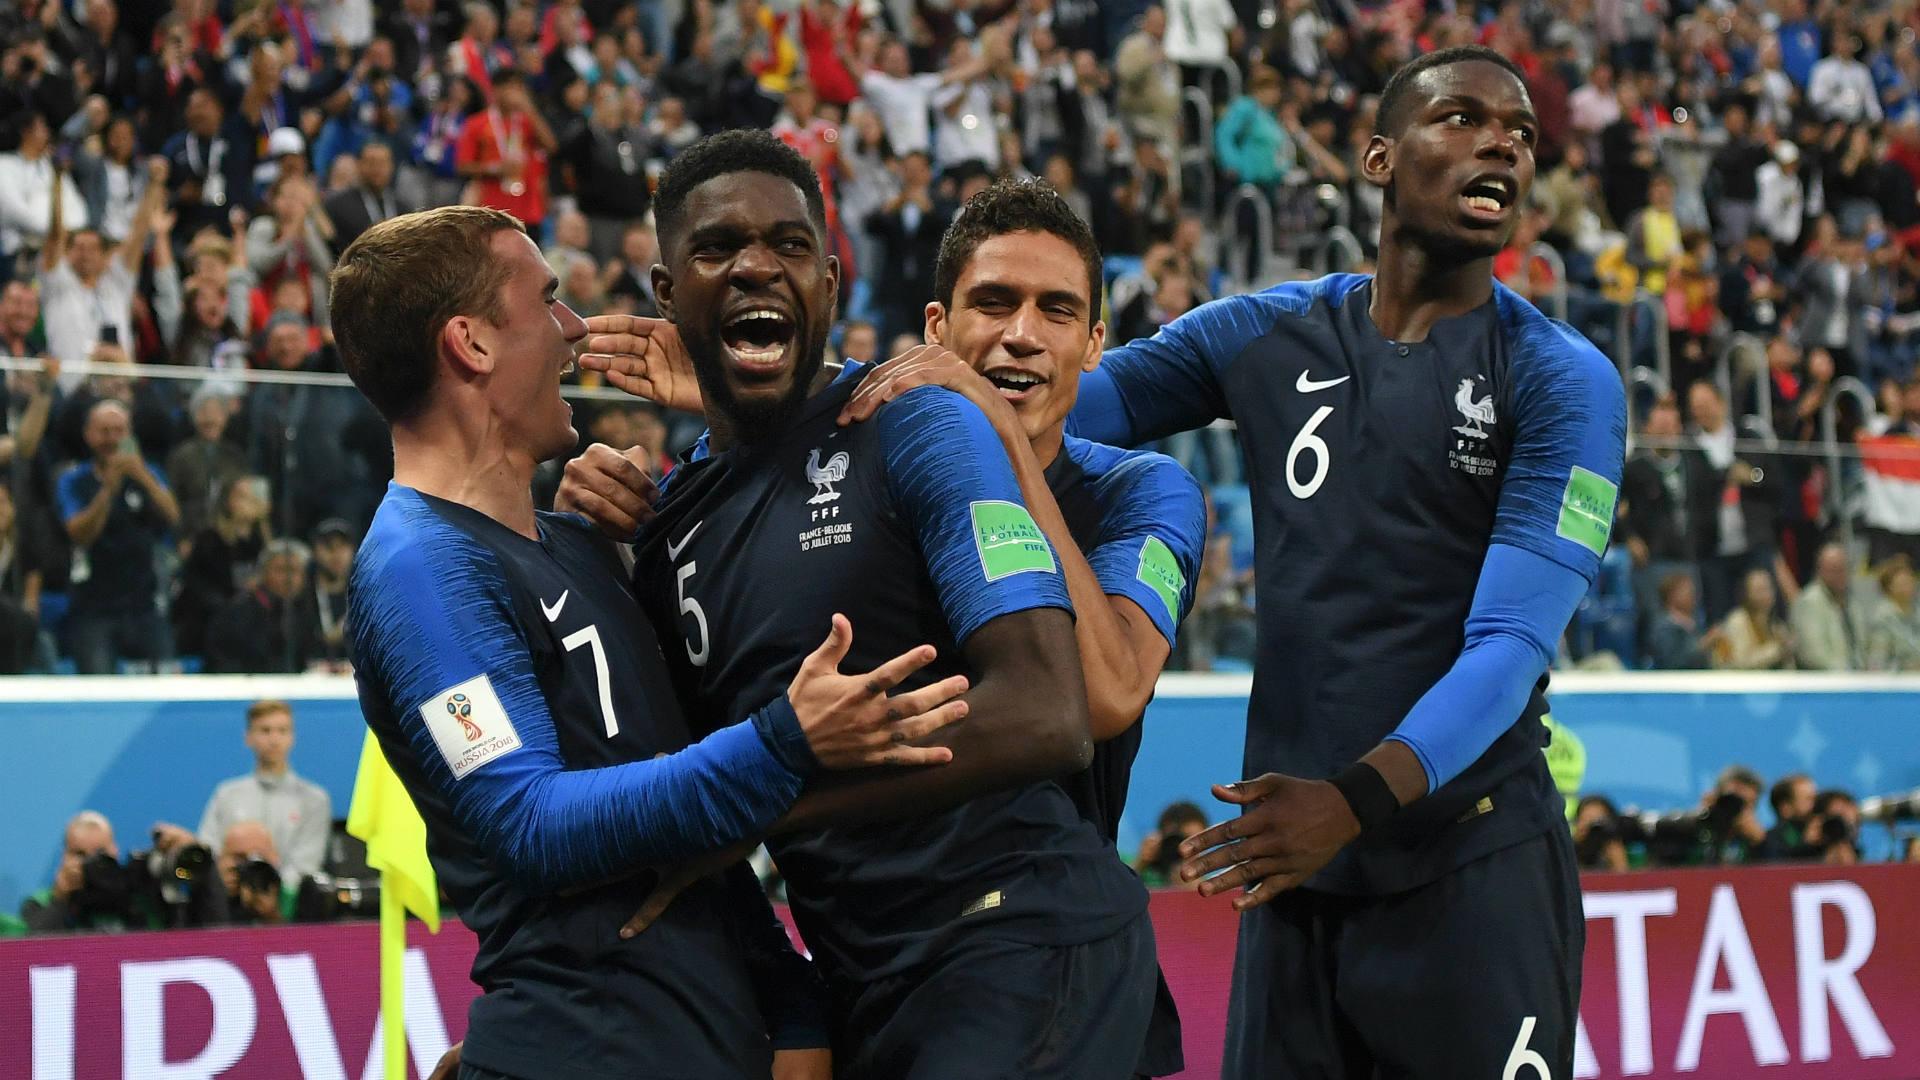 World Cup final odds: France opens as huge favorites vs. Croatia | Soccer | Sporting News